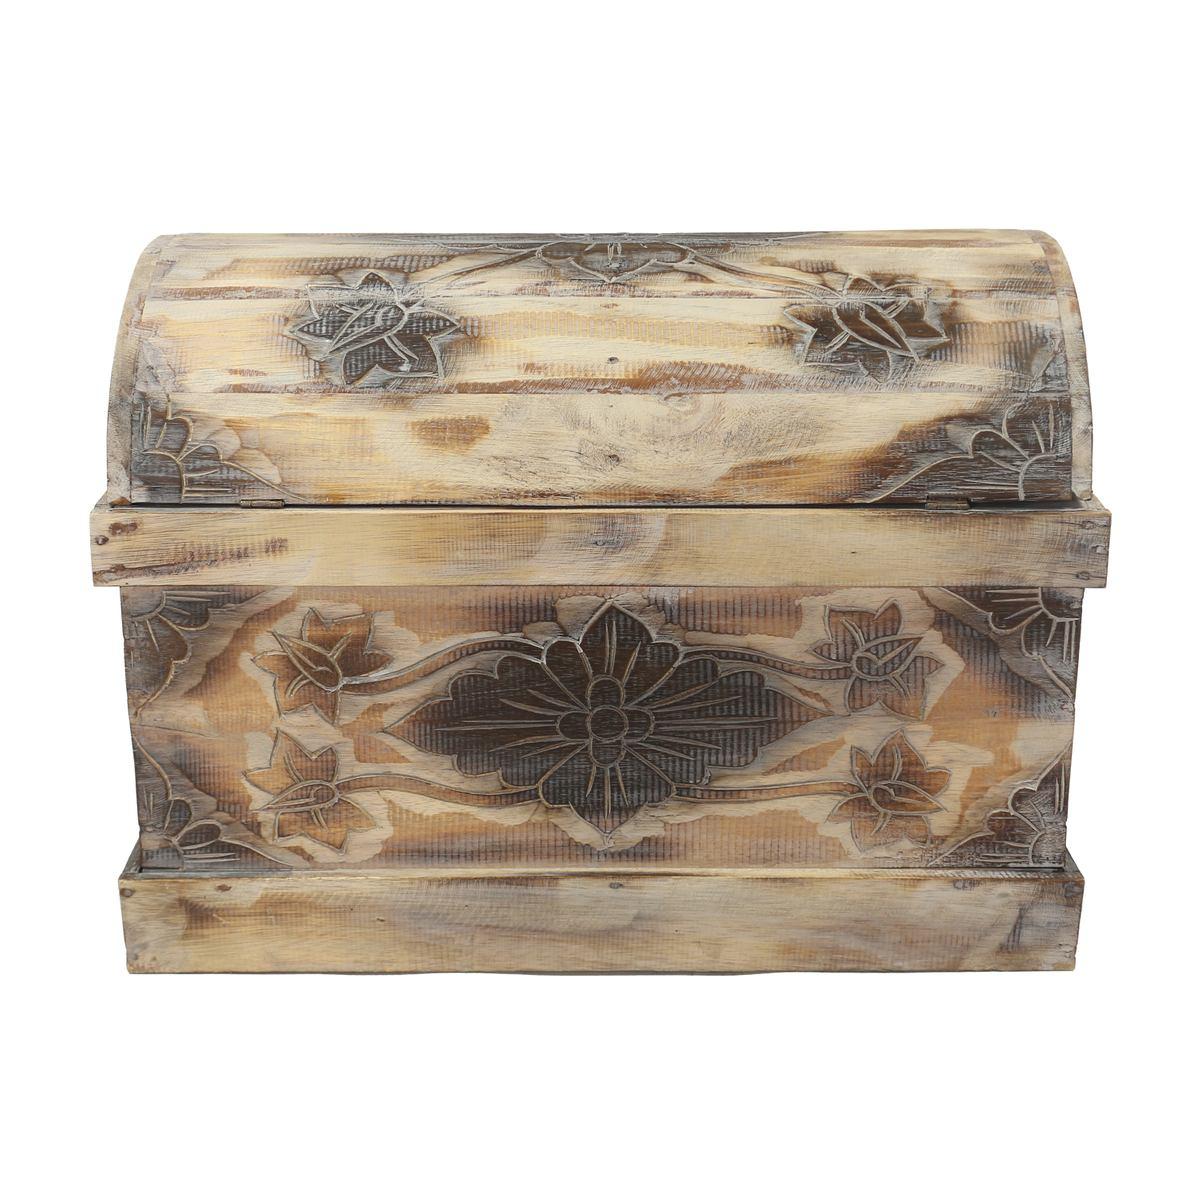 truhe schatztruhe dekotruhe dekokiste box blumen kiste wei shabby chic landhausstil 62 cm. Black Bedroom Furniture Sets. Home Design Ideas